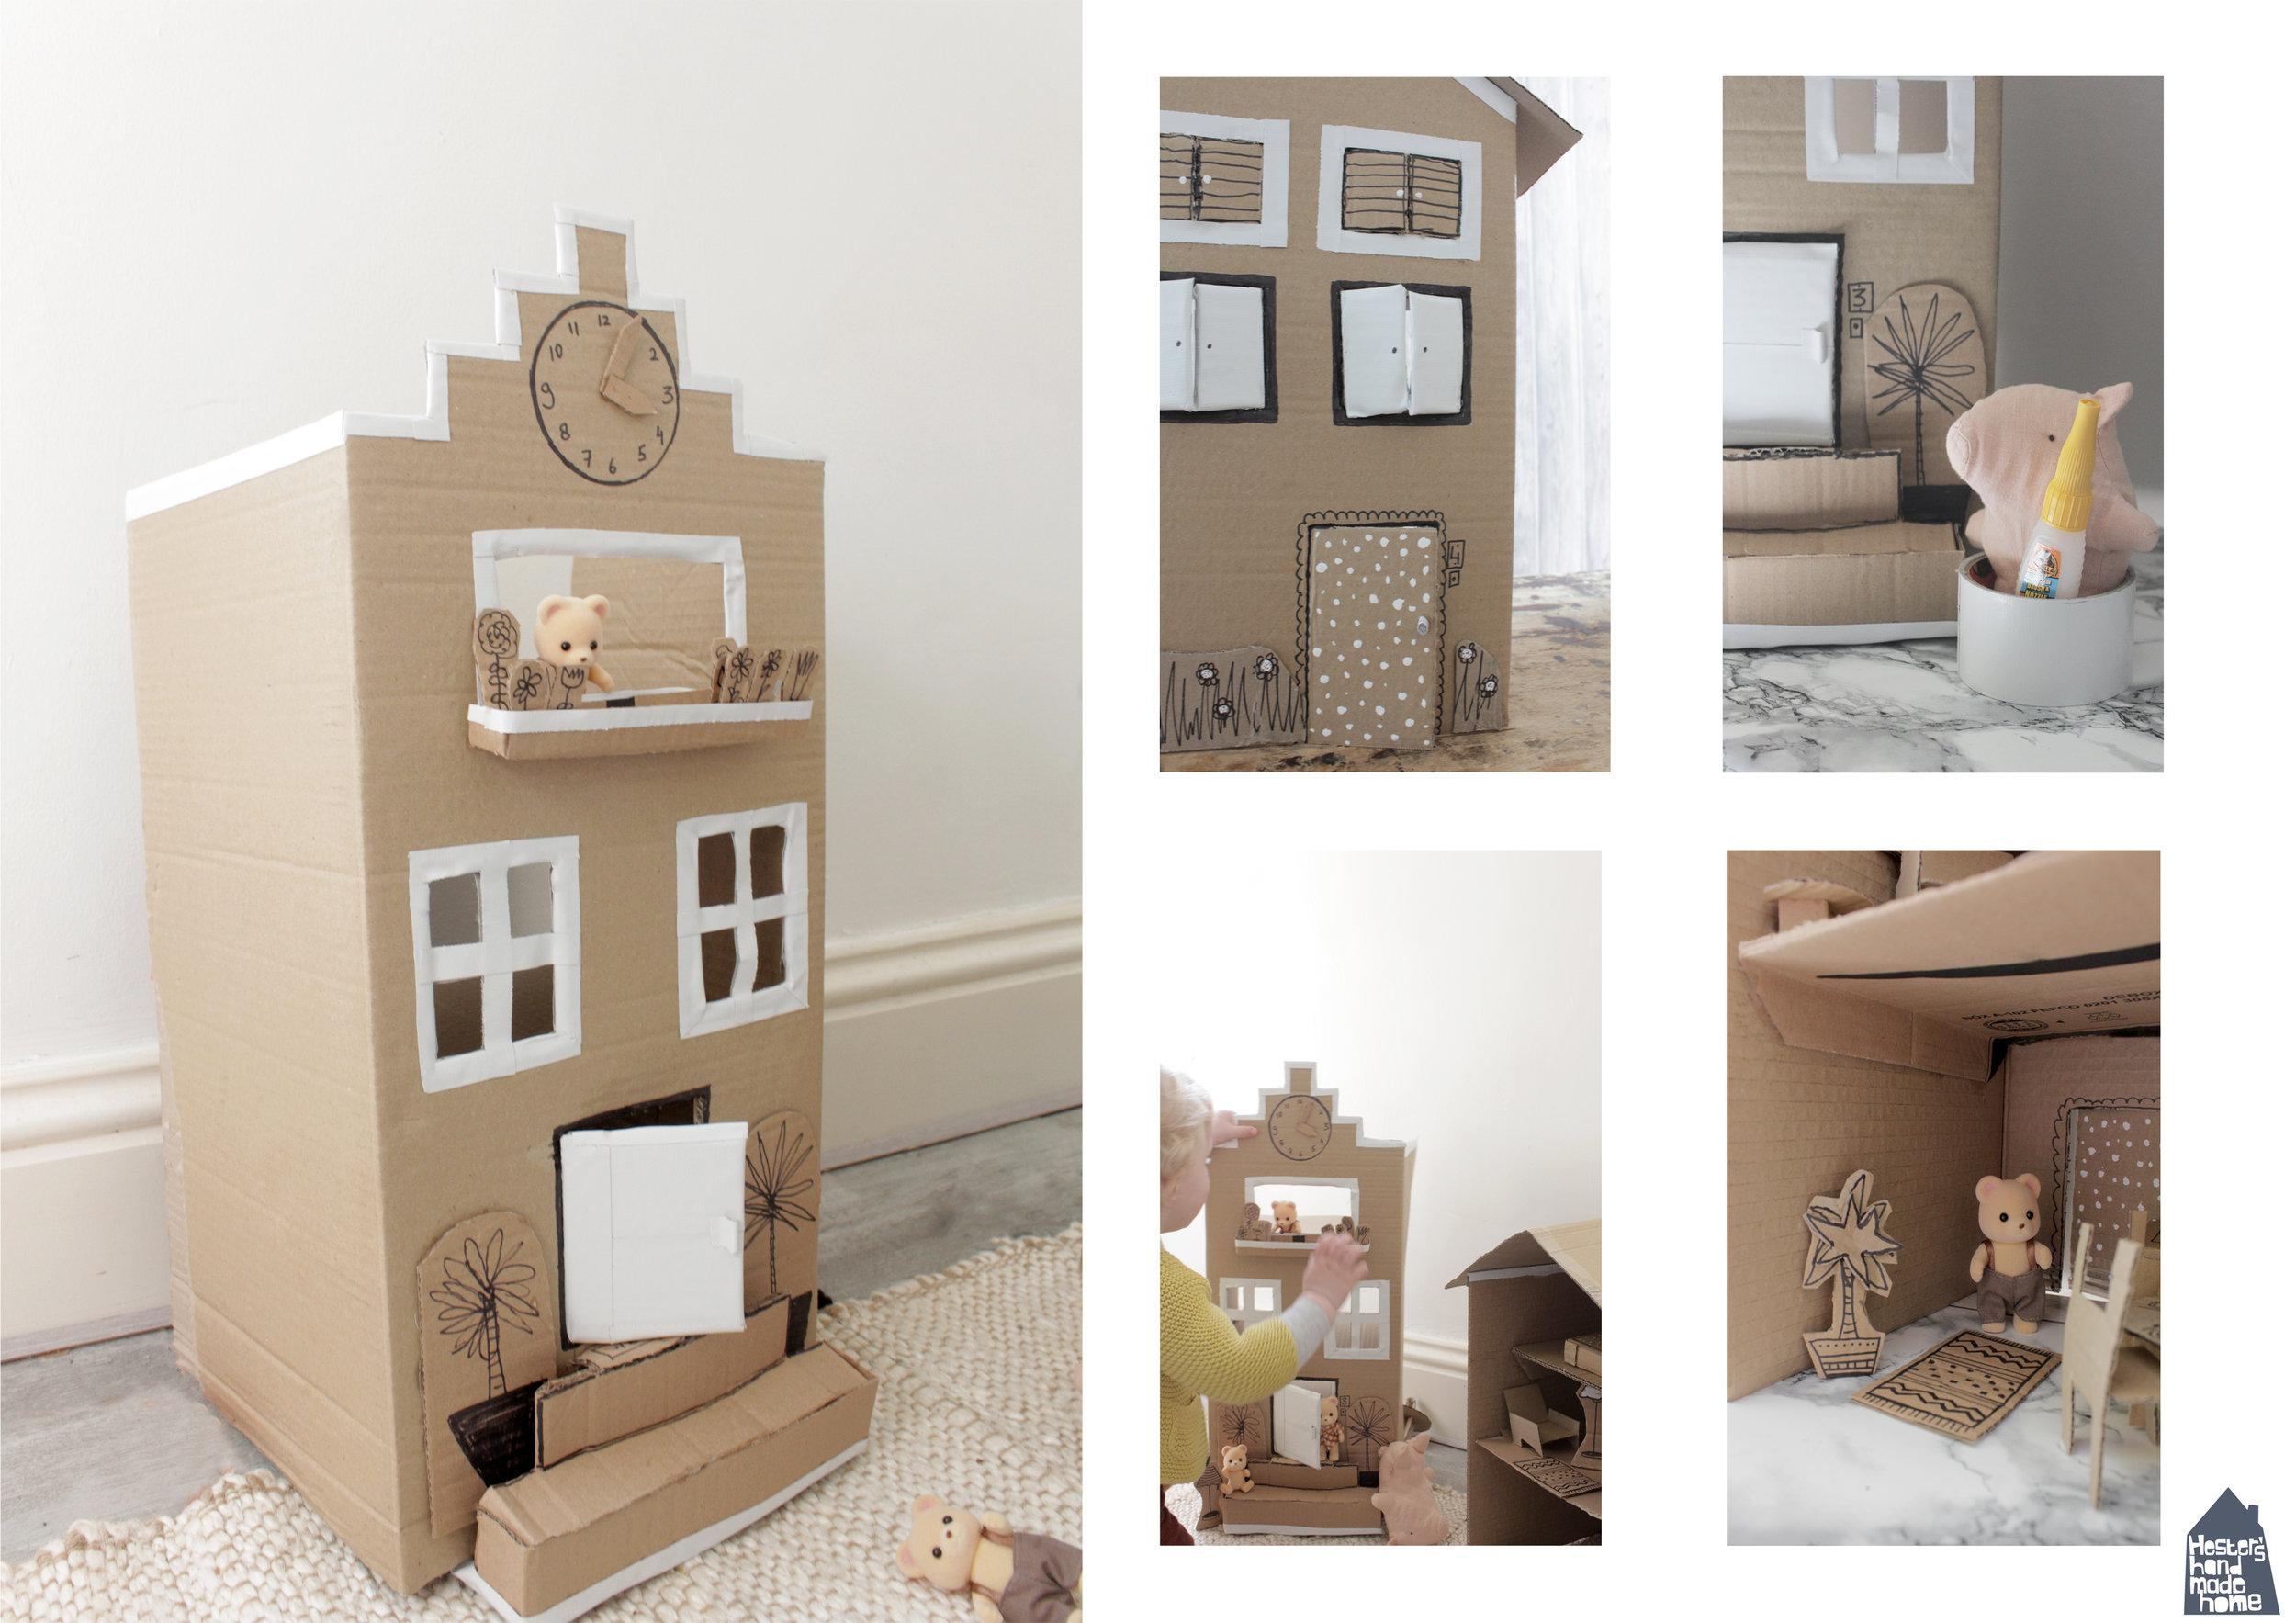 Cardboard dolls house tutorial by Hesters Handmade Home